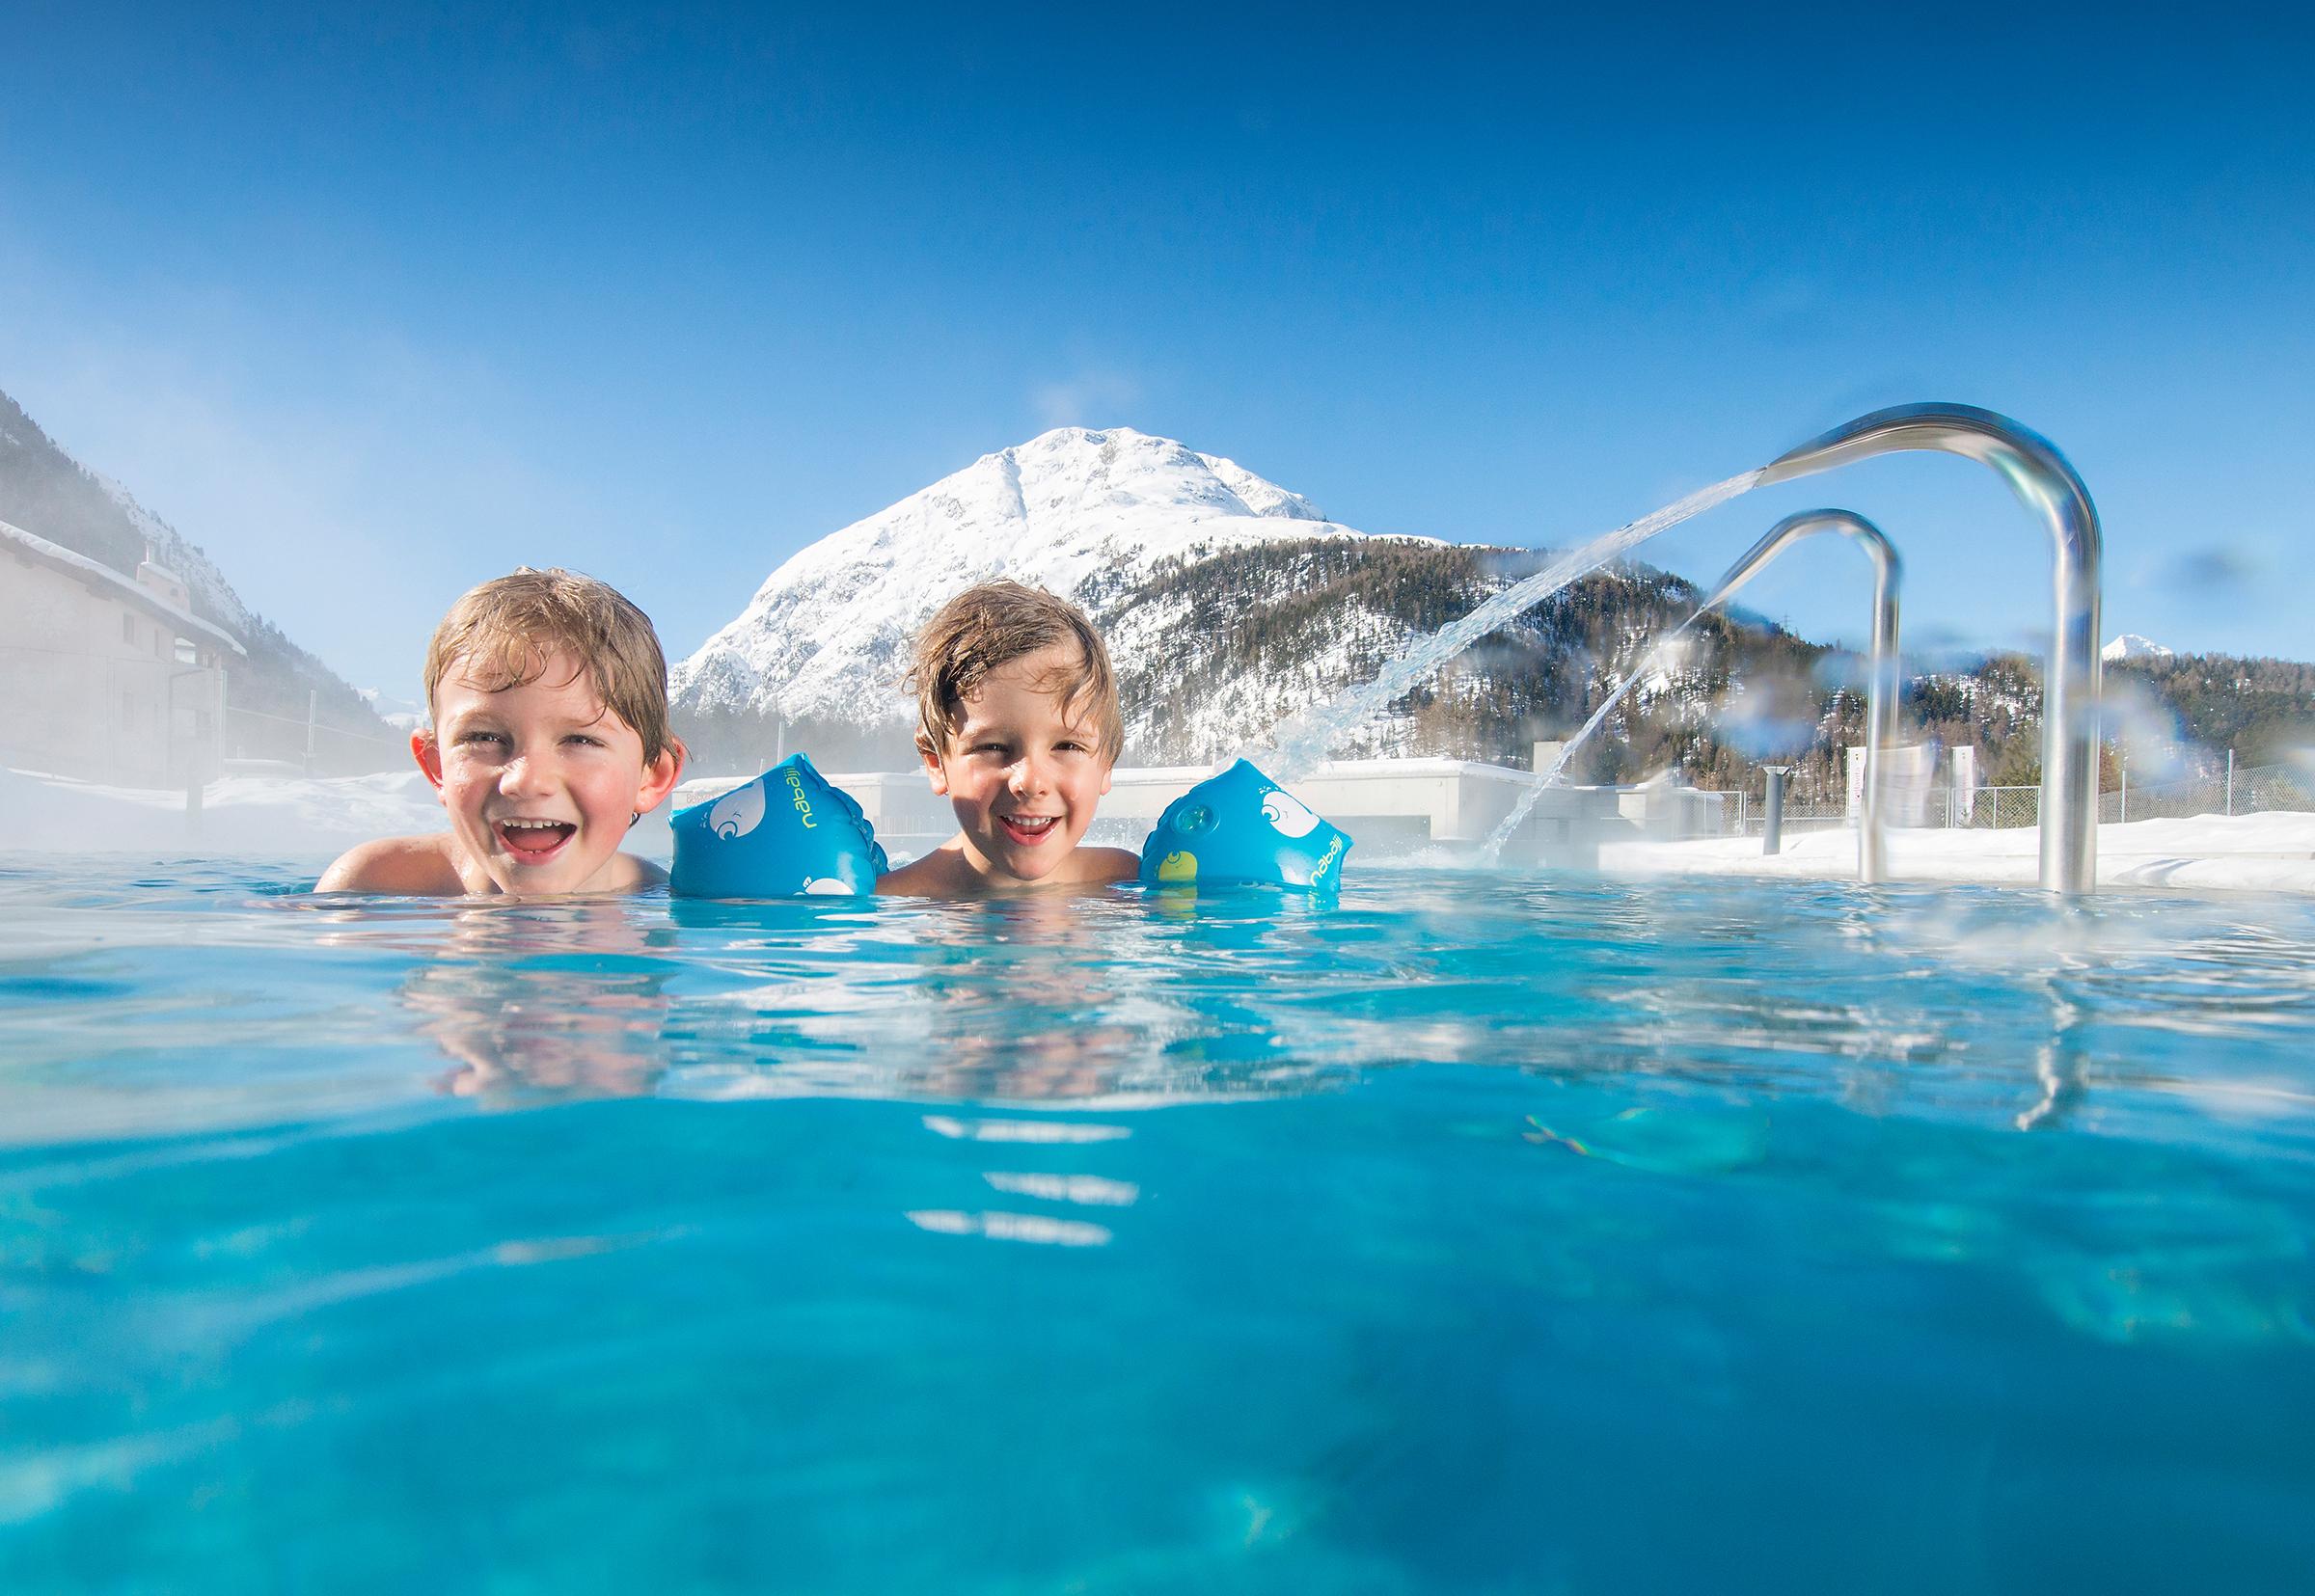 Bellavita Erlebnisbad und Spa, Pontresina